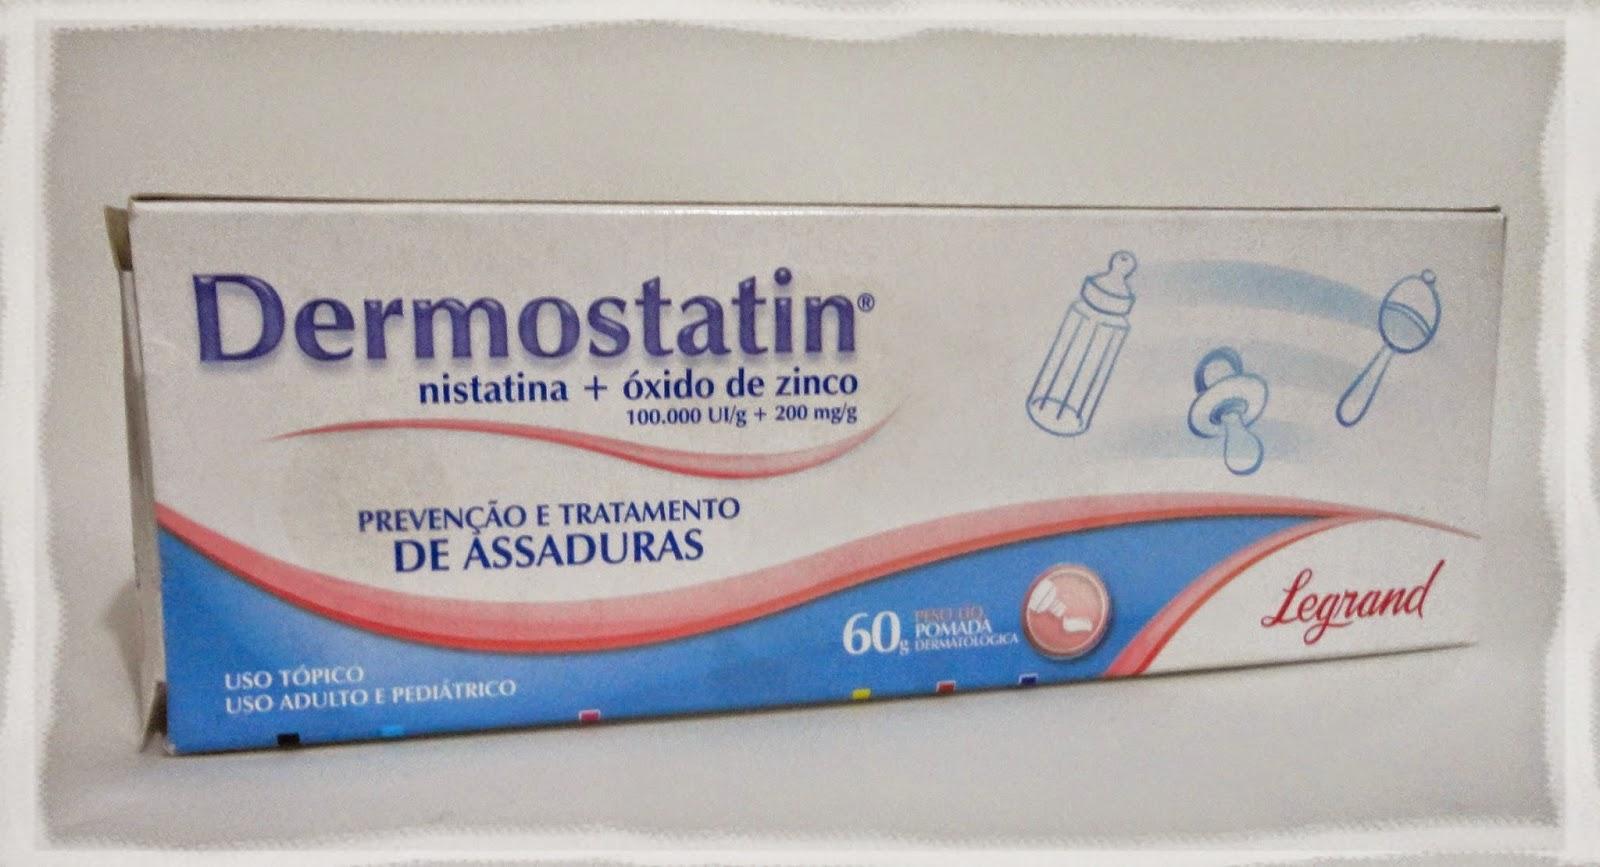 pomadas que contem corticosteroides